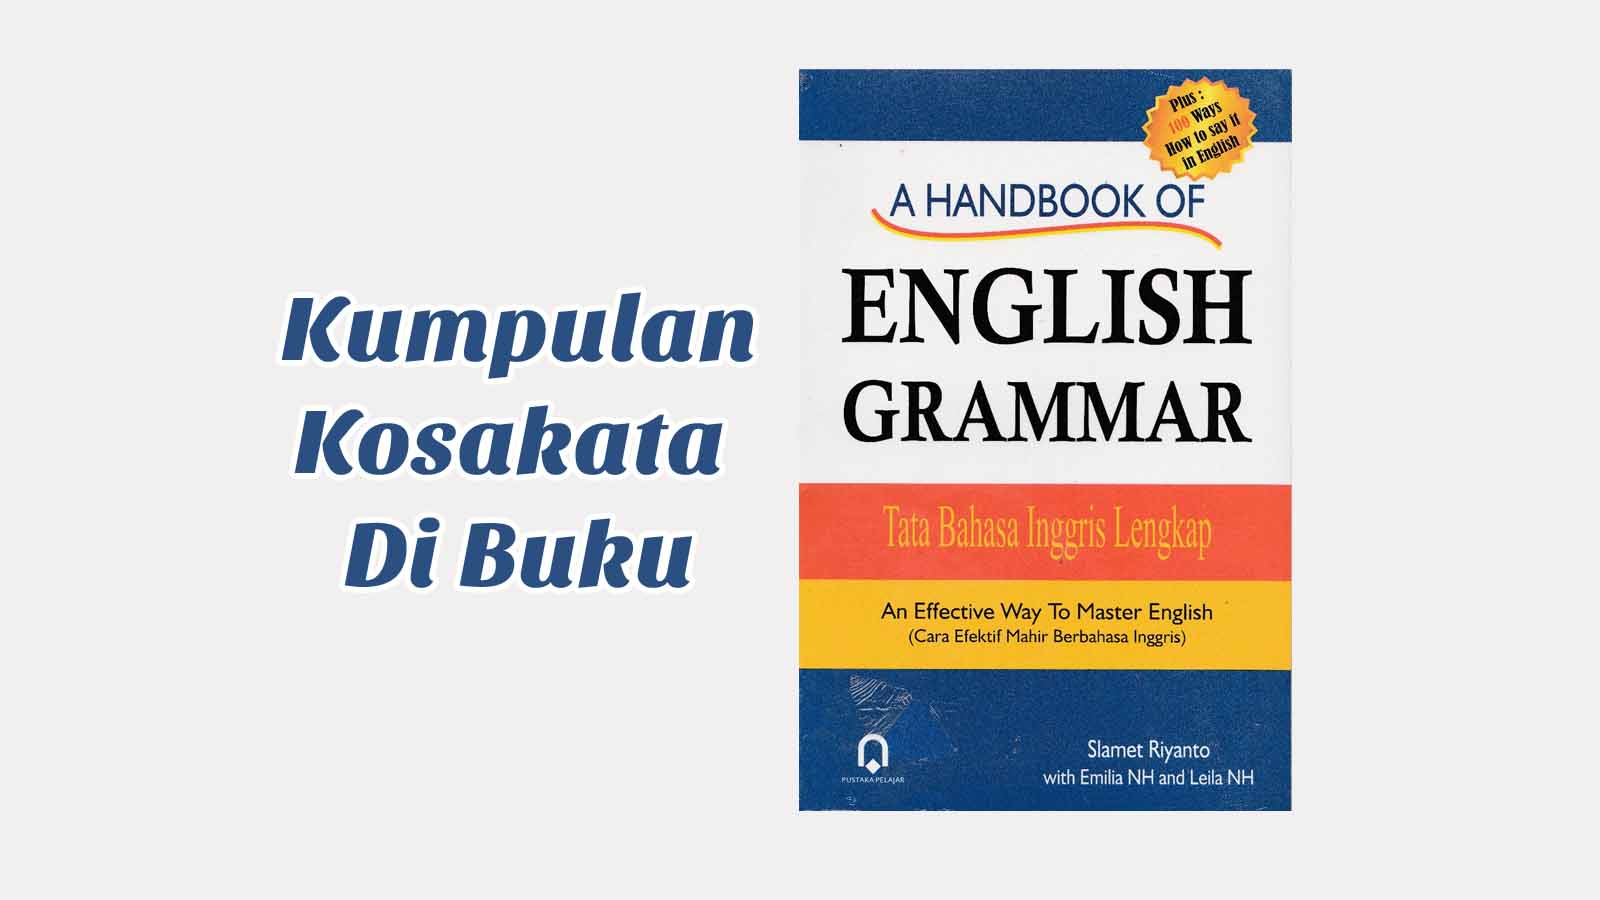 Kumpulan Kosakata di Buku A Handbook Of English Grammer